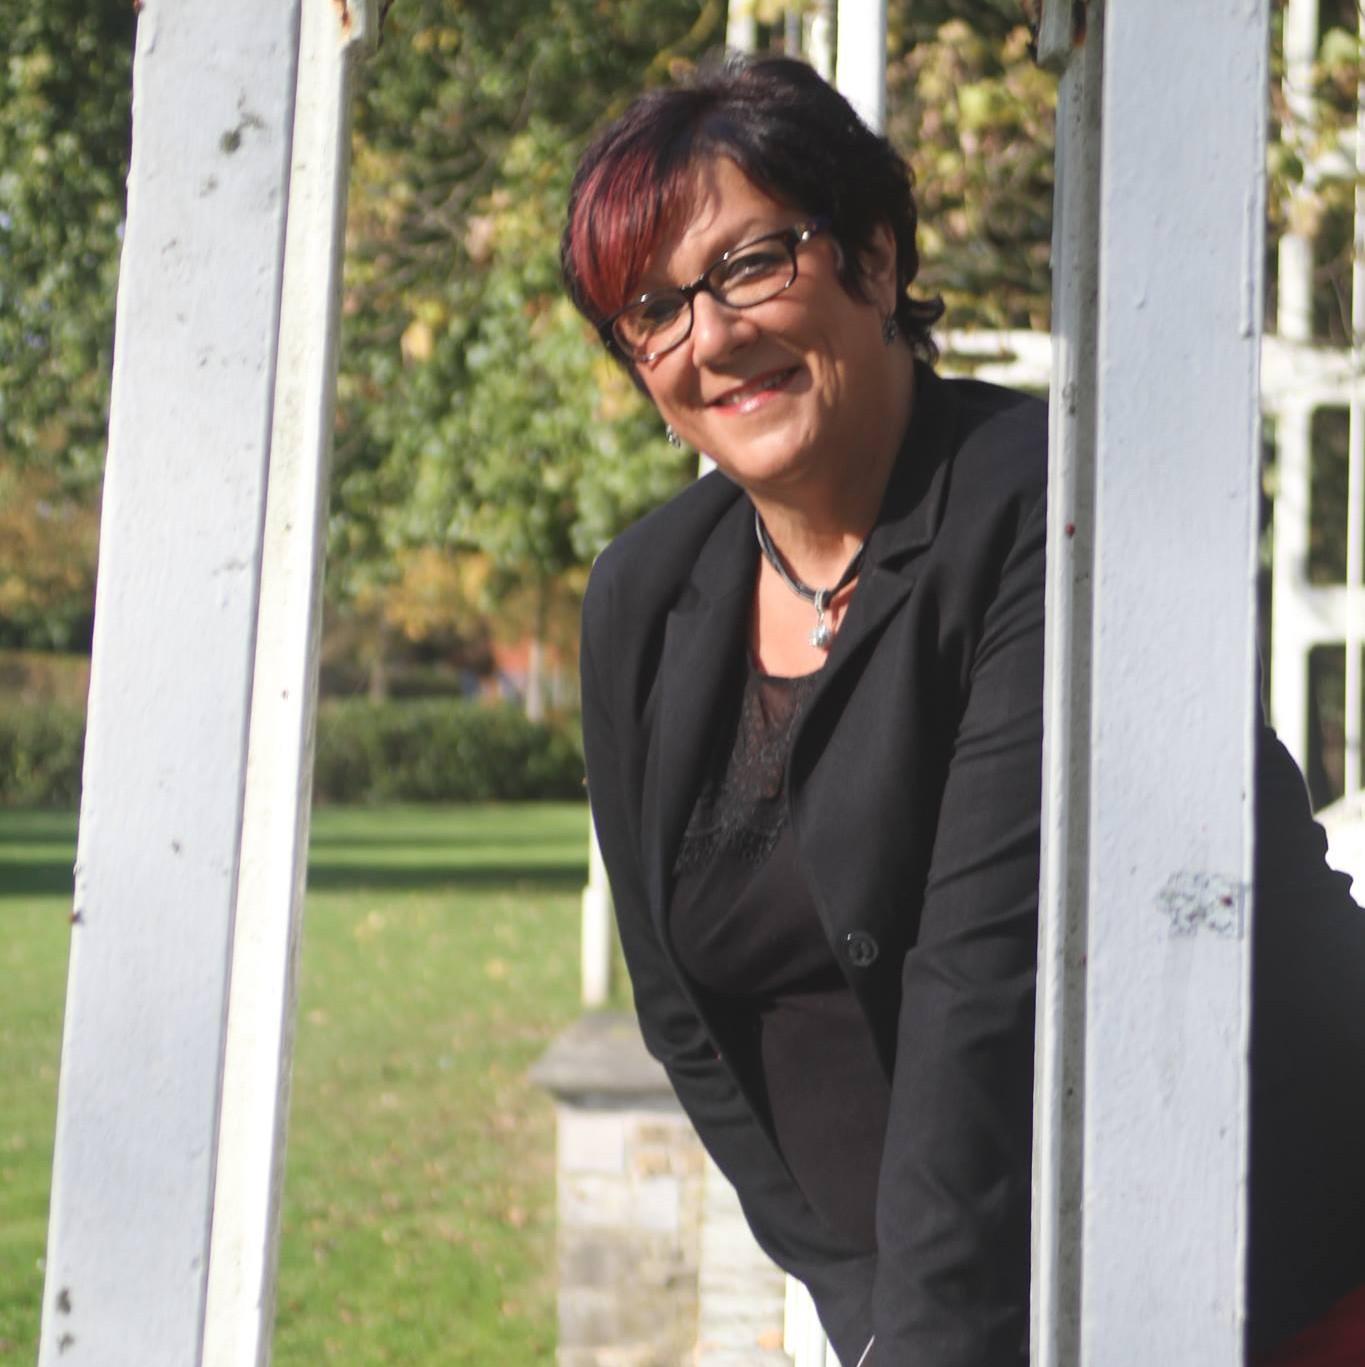 Marina Oellibrandt